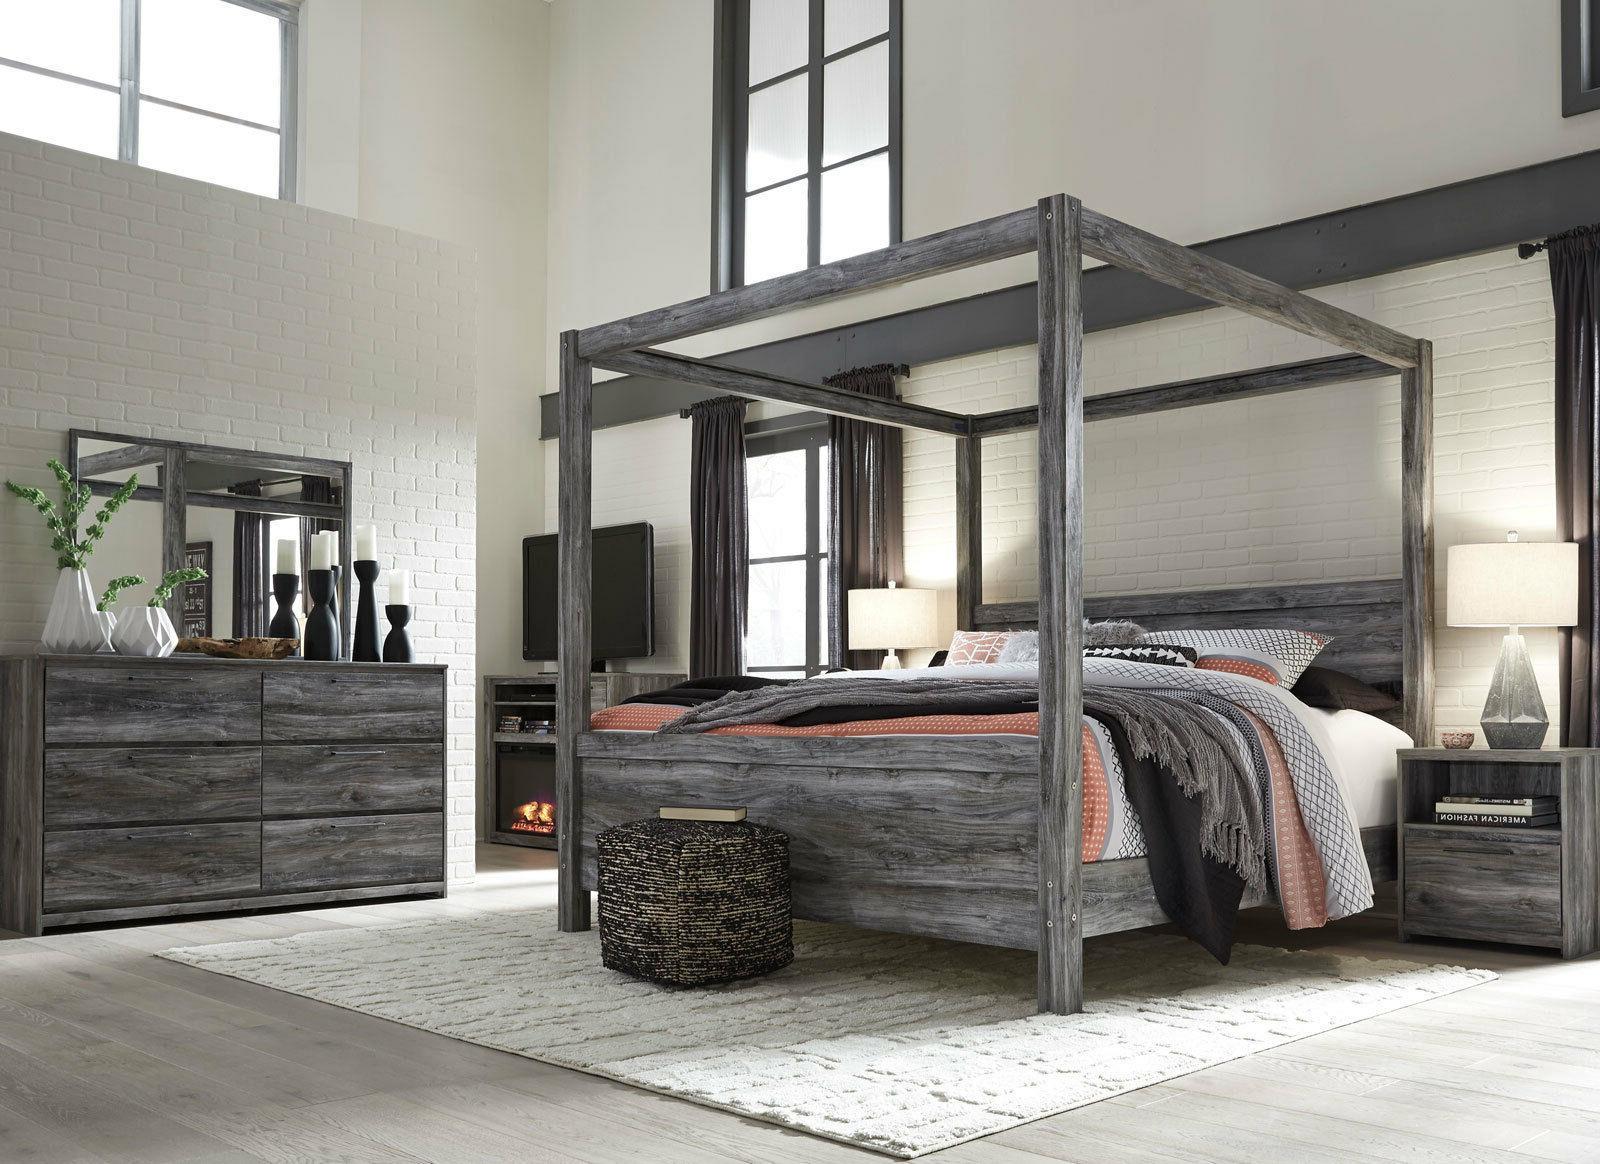 Bedroom Sets Ambrose Modern Smokey Gray 5pcs Bedroom Set Furniture W King Poster Canopy Bed Home Garden Mbln Org